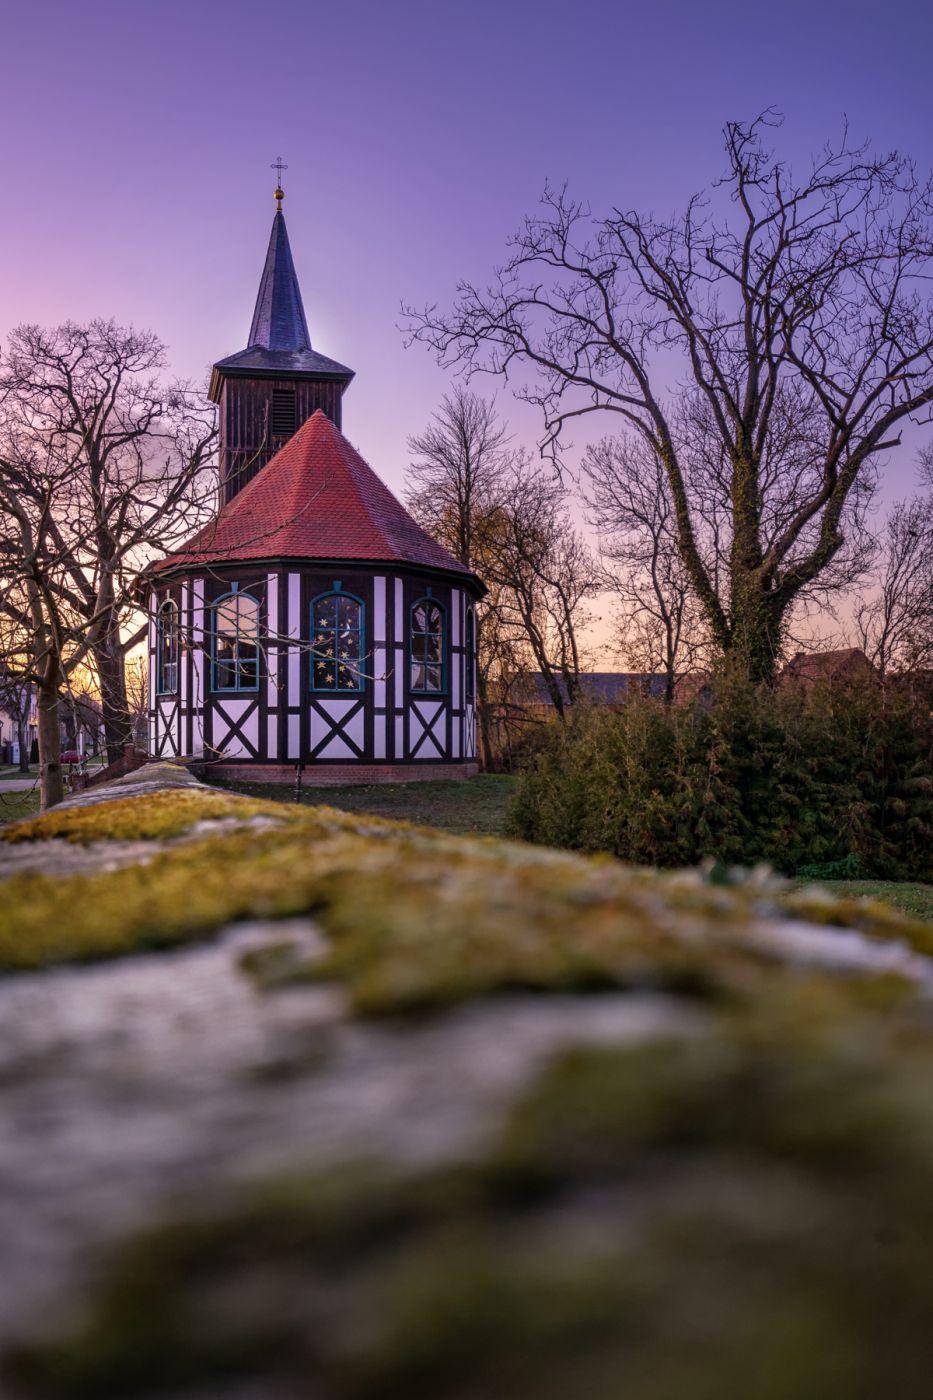 Village Church Altlüdersdorf, Germany